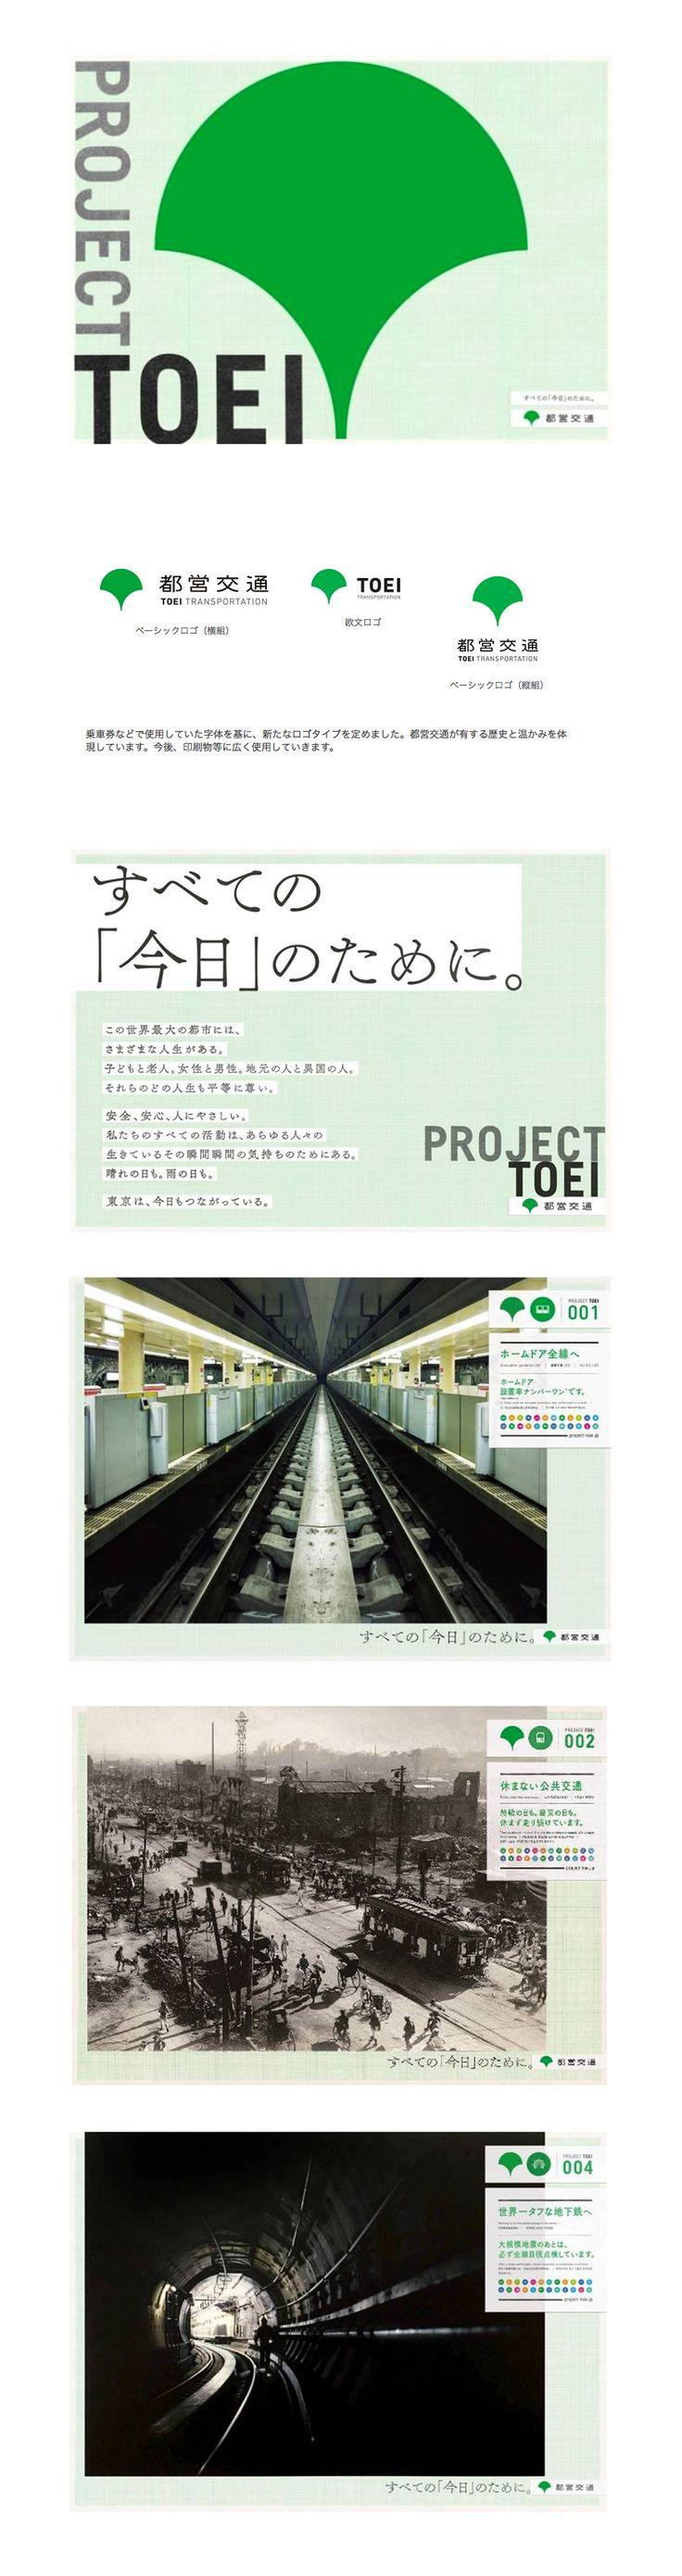 都営交通 TOEI TRANSPORTATION